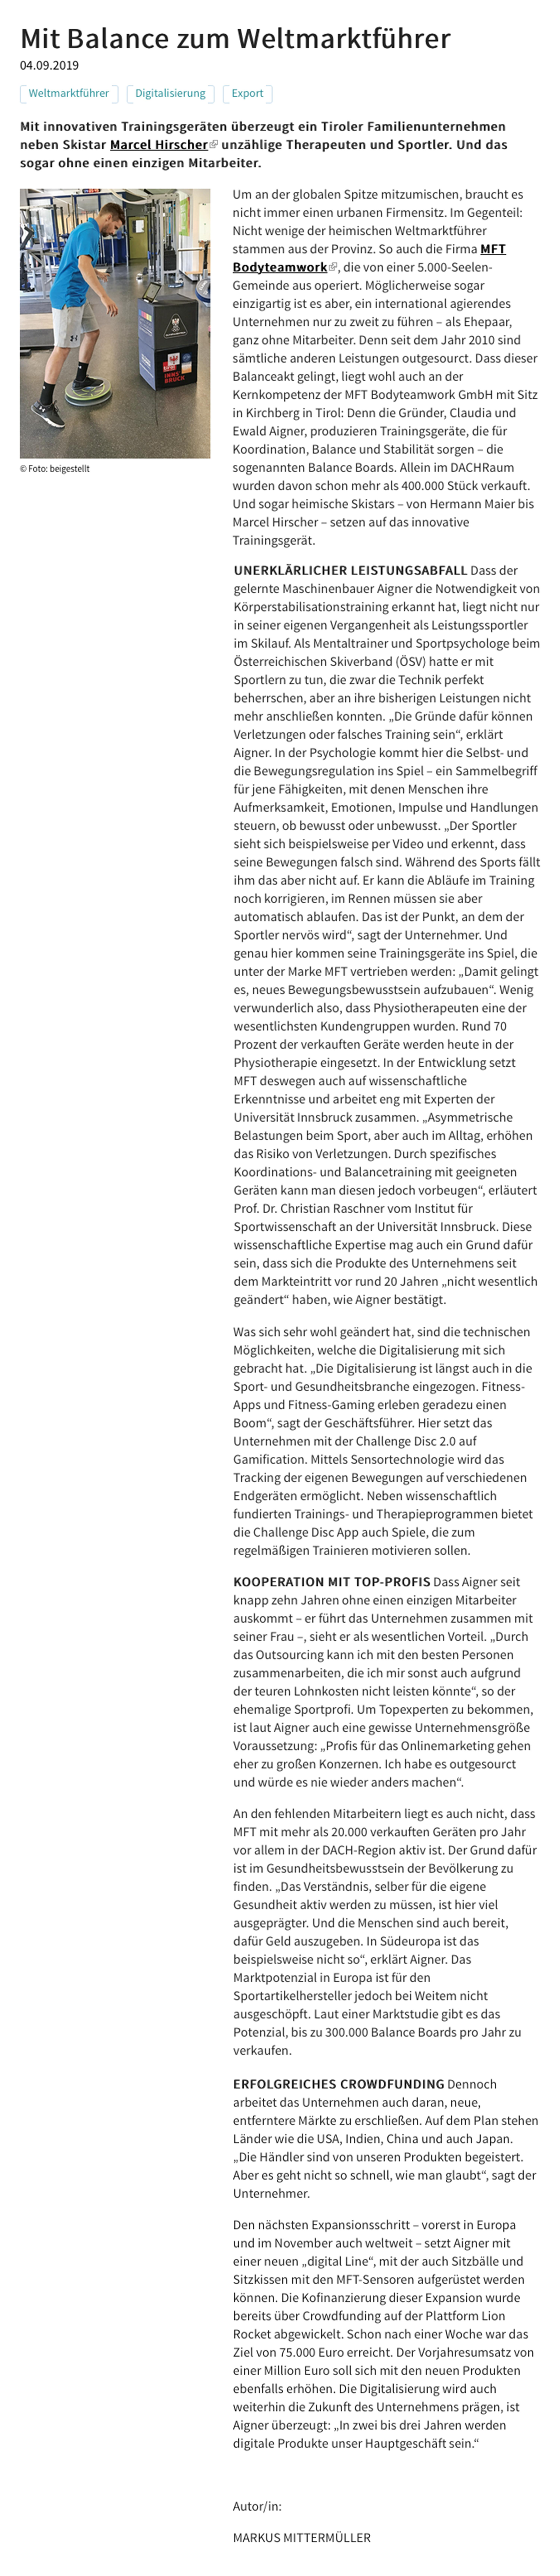 Jeder Fuß ist anders - Presseartikel 01/2018